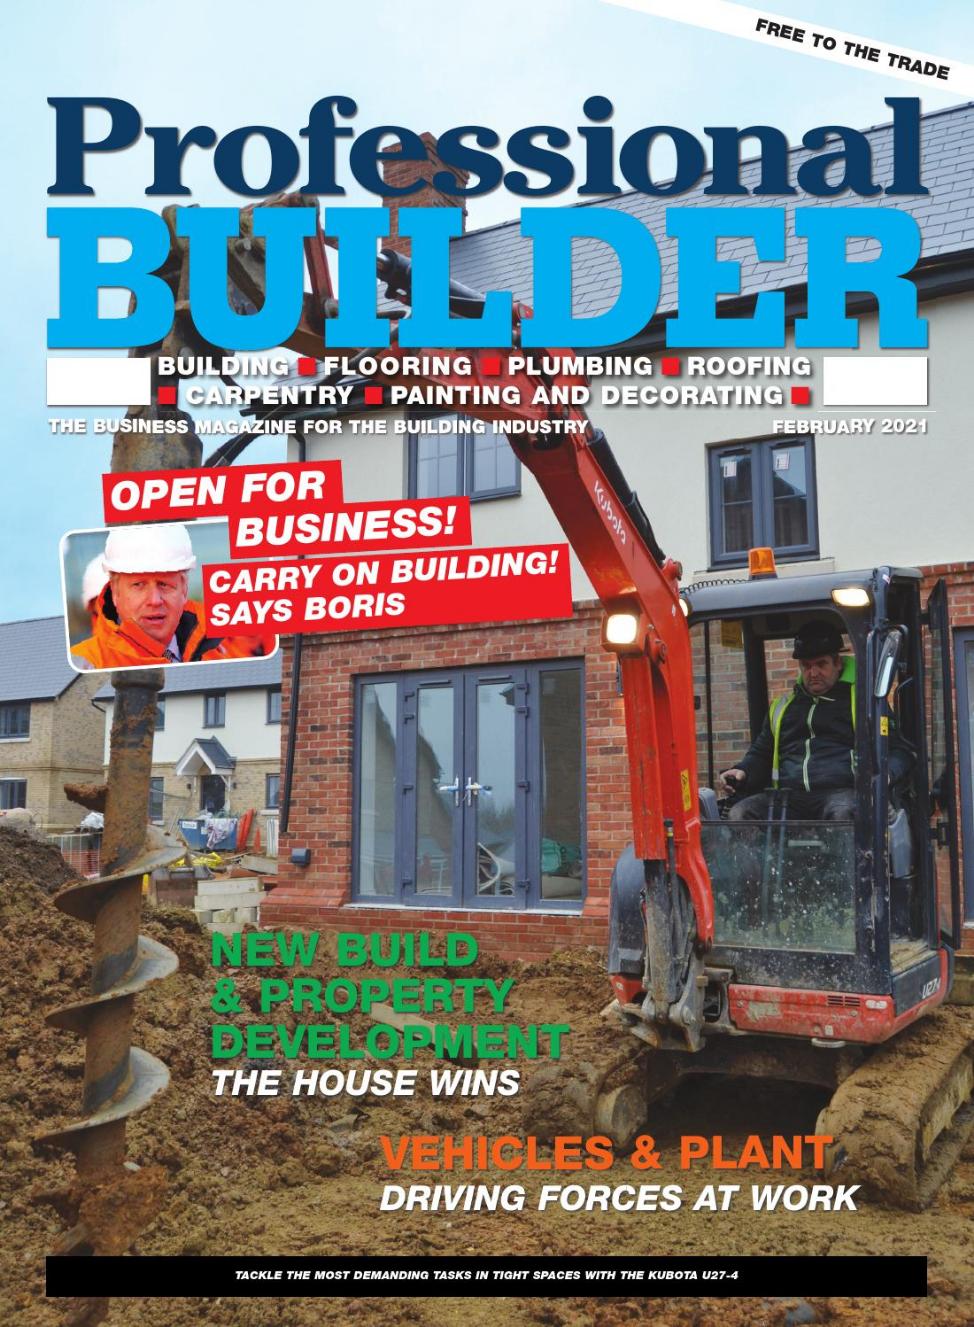 CellBox Trades in Professional Builder Magazine